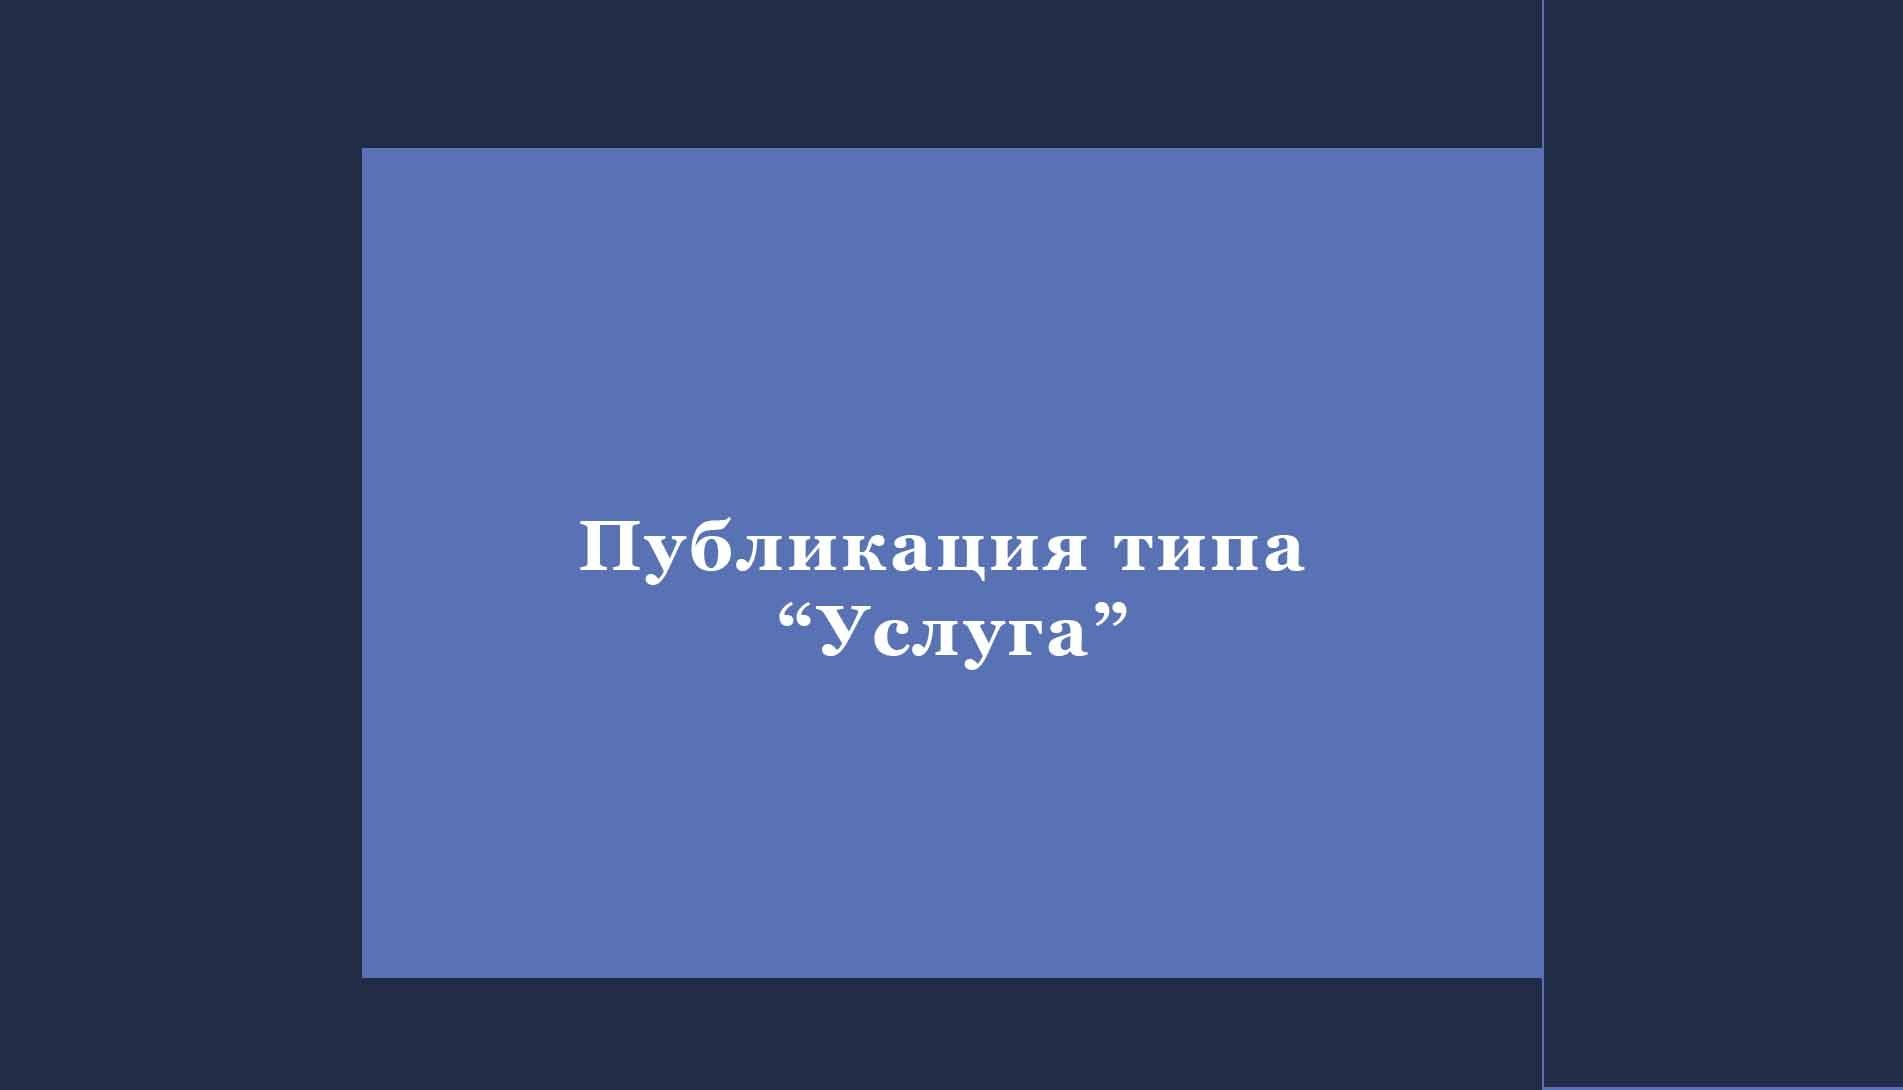 4_usluga_glavnaya_fotografiya_publikacii_.jpg